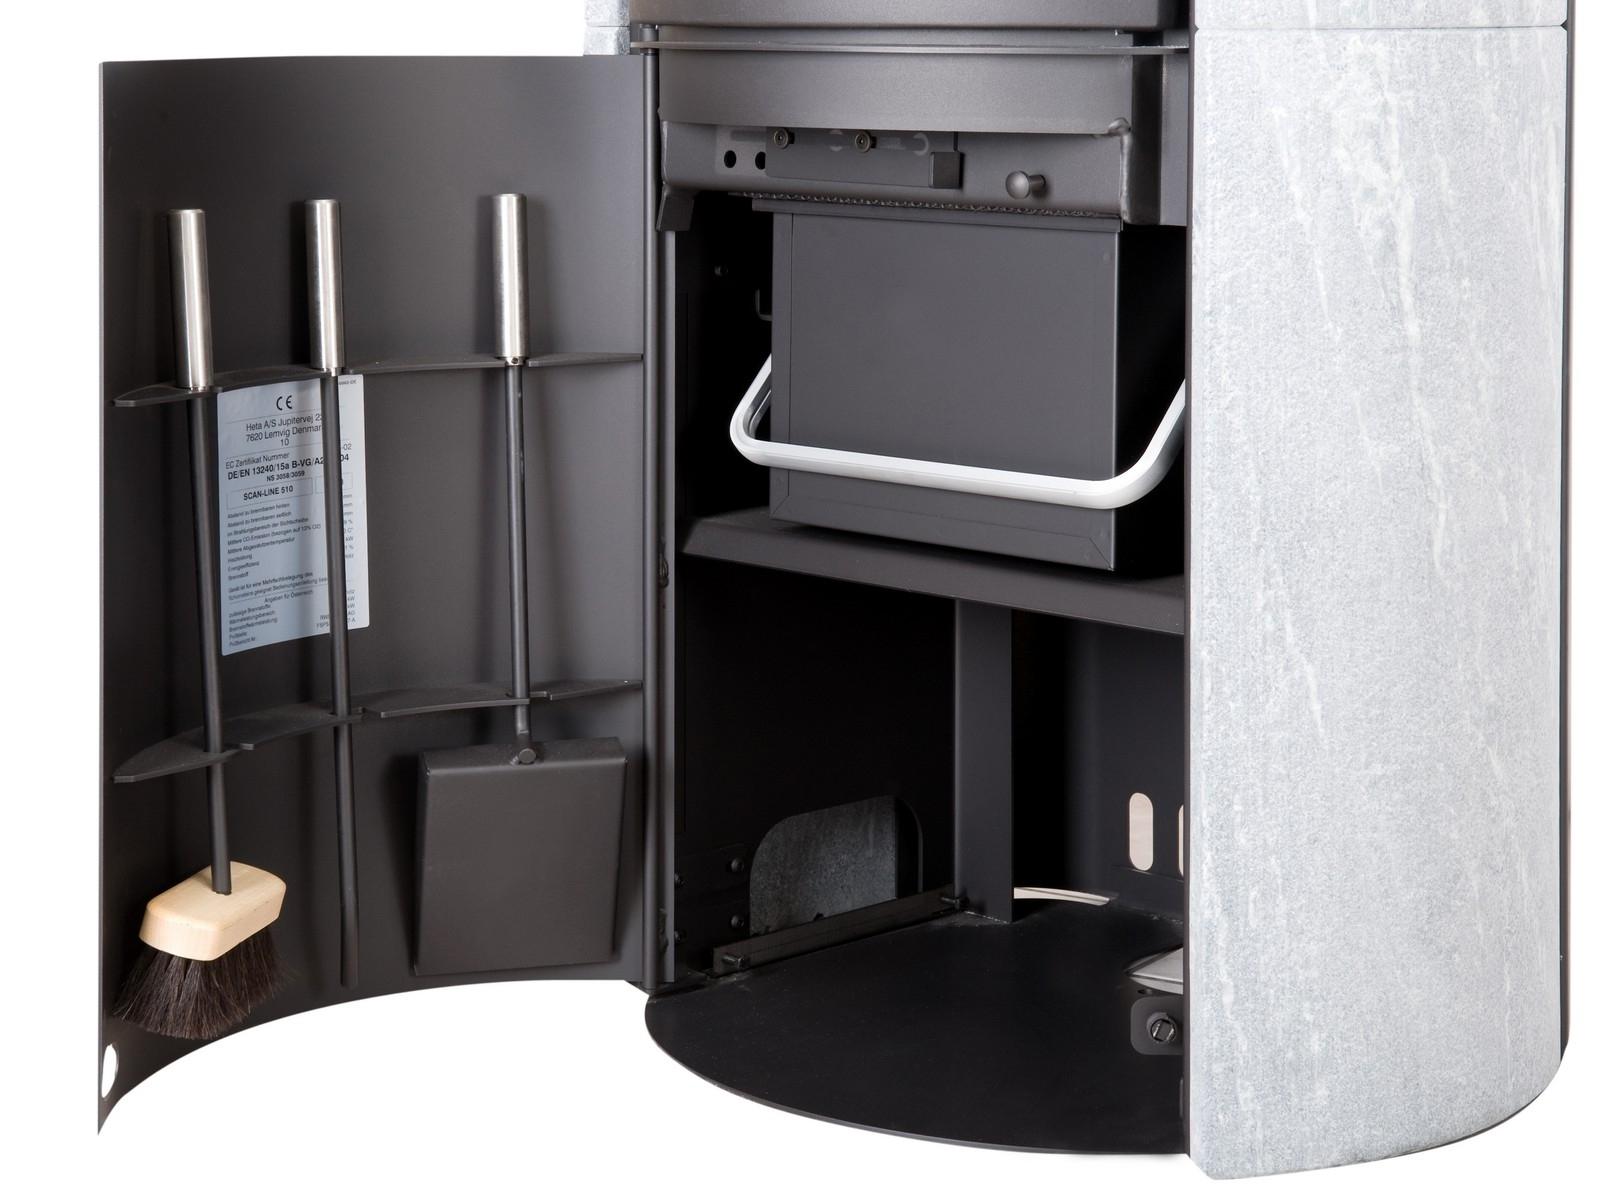 heta sl 820 r f chauffage po les bois standard. Black Bedroom Furniture Sets. Home Design Ideas